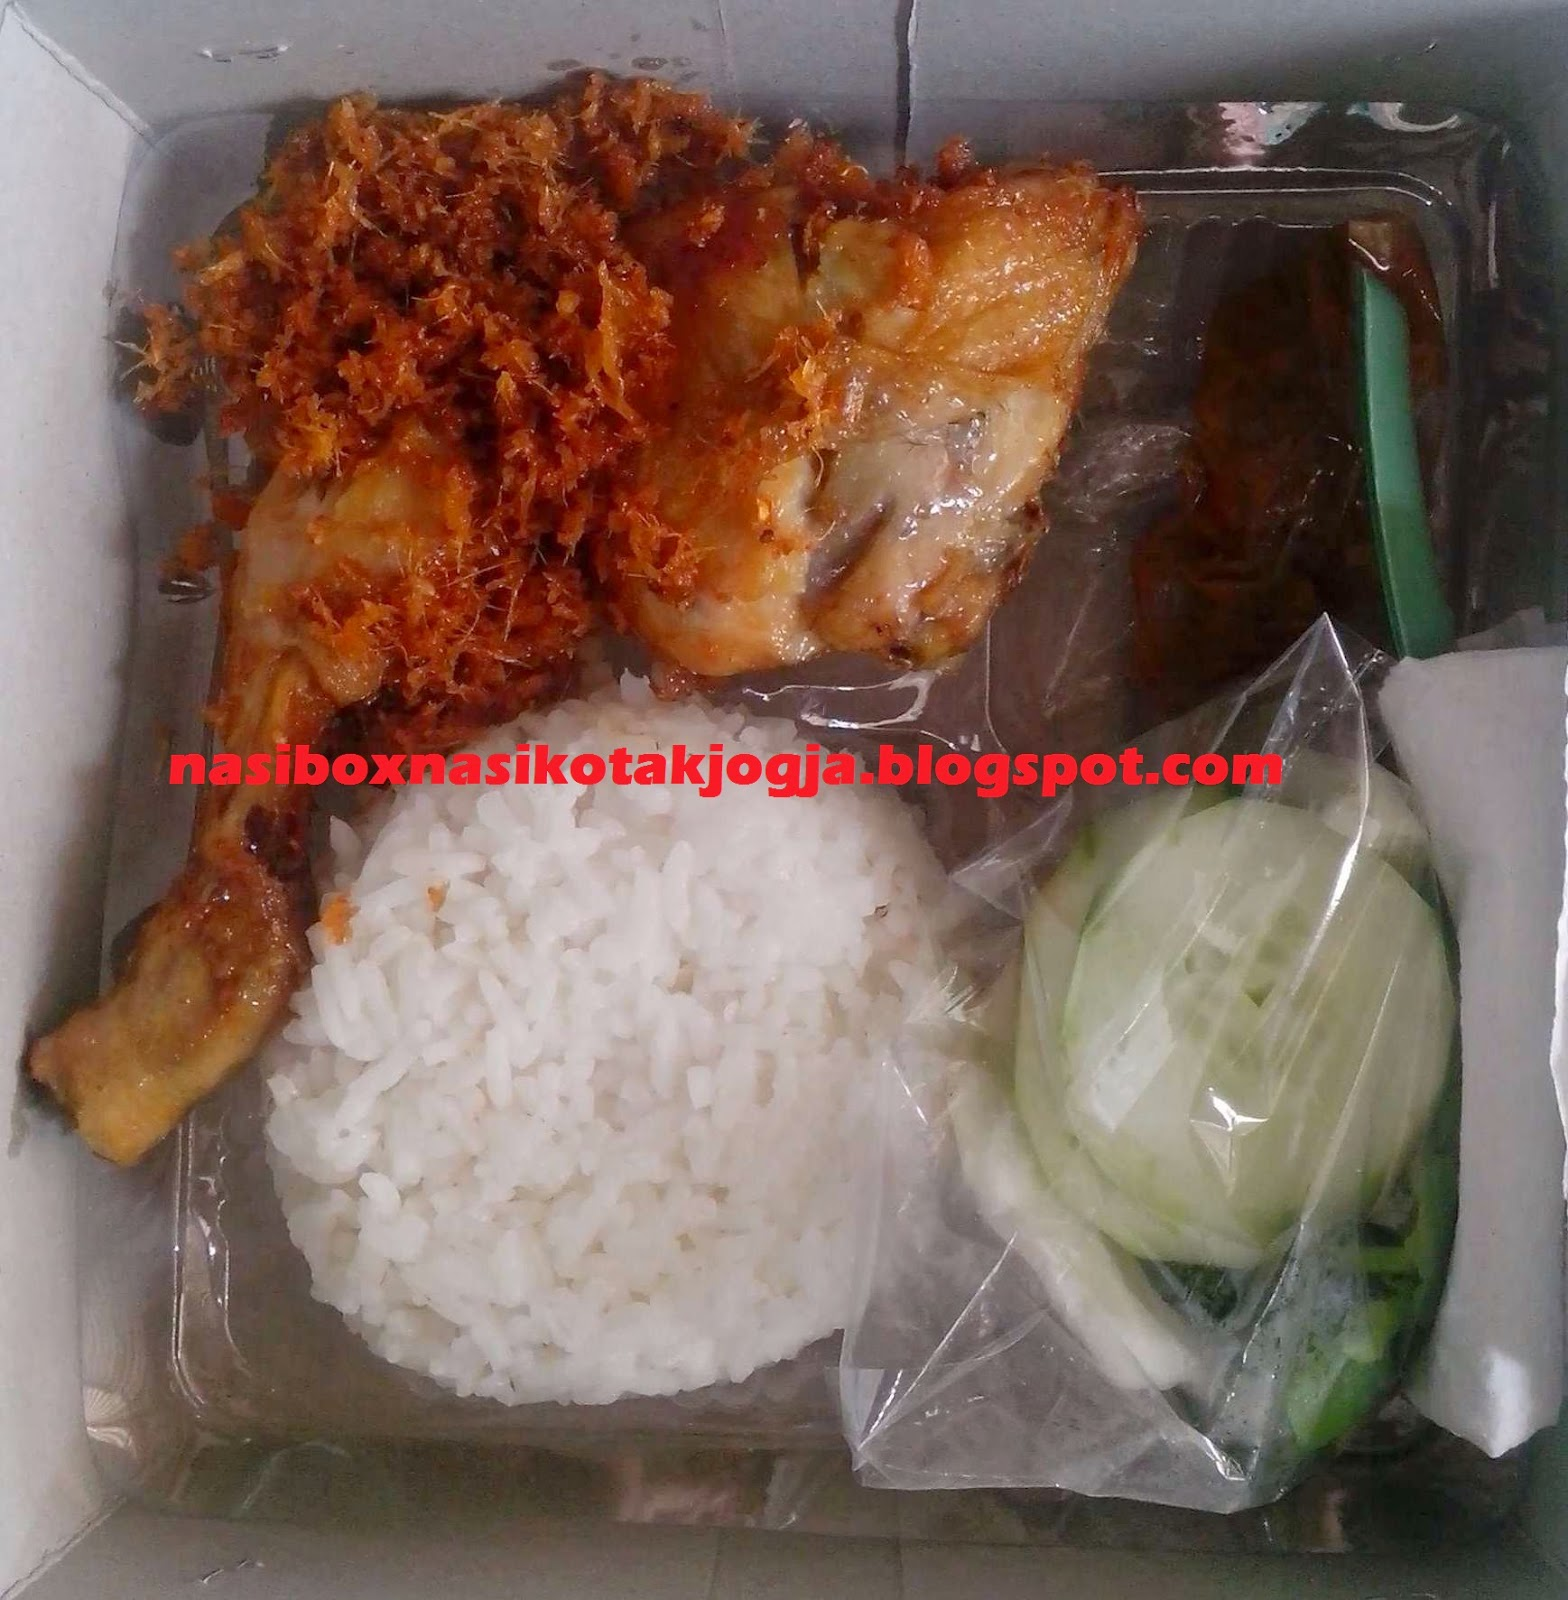 Nasi Box Jogja,Nasi Box Yogyakarta, Nasi Kotak Jogja, Nasi Kotak Yogyakarta, Harga Nasi Box Jogja, Menu Nasi Box Yogyakarta, Catering Nasi Kotak Jogja